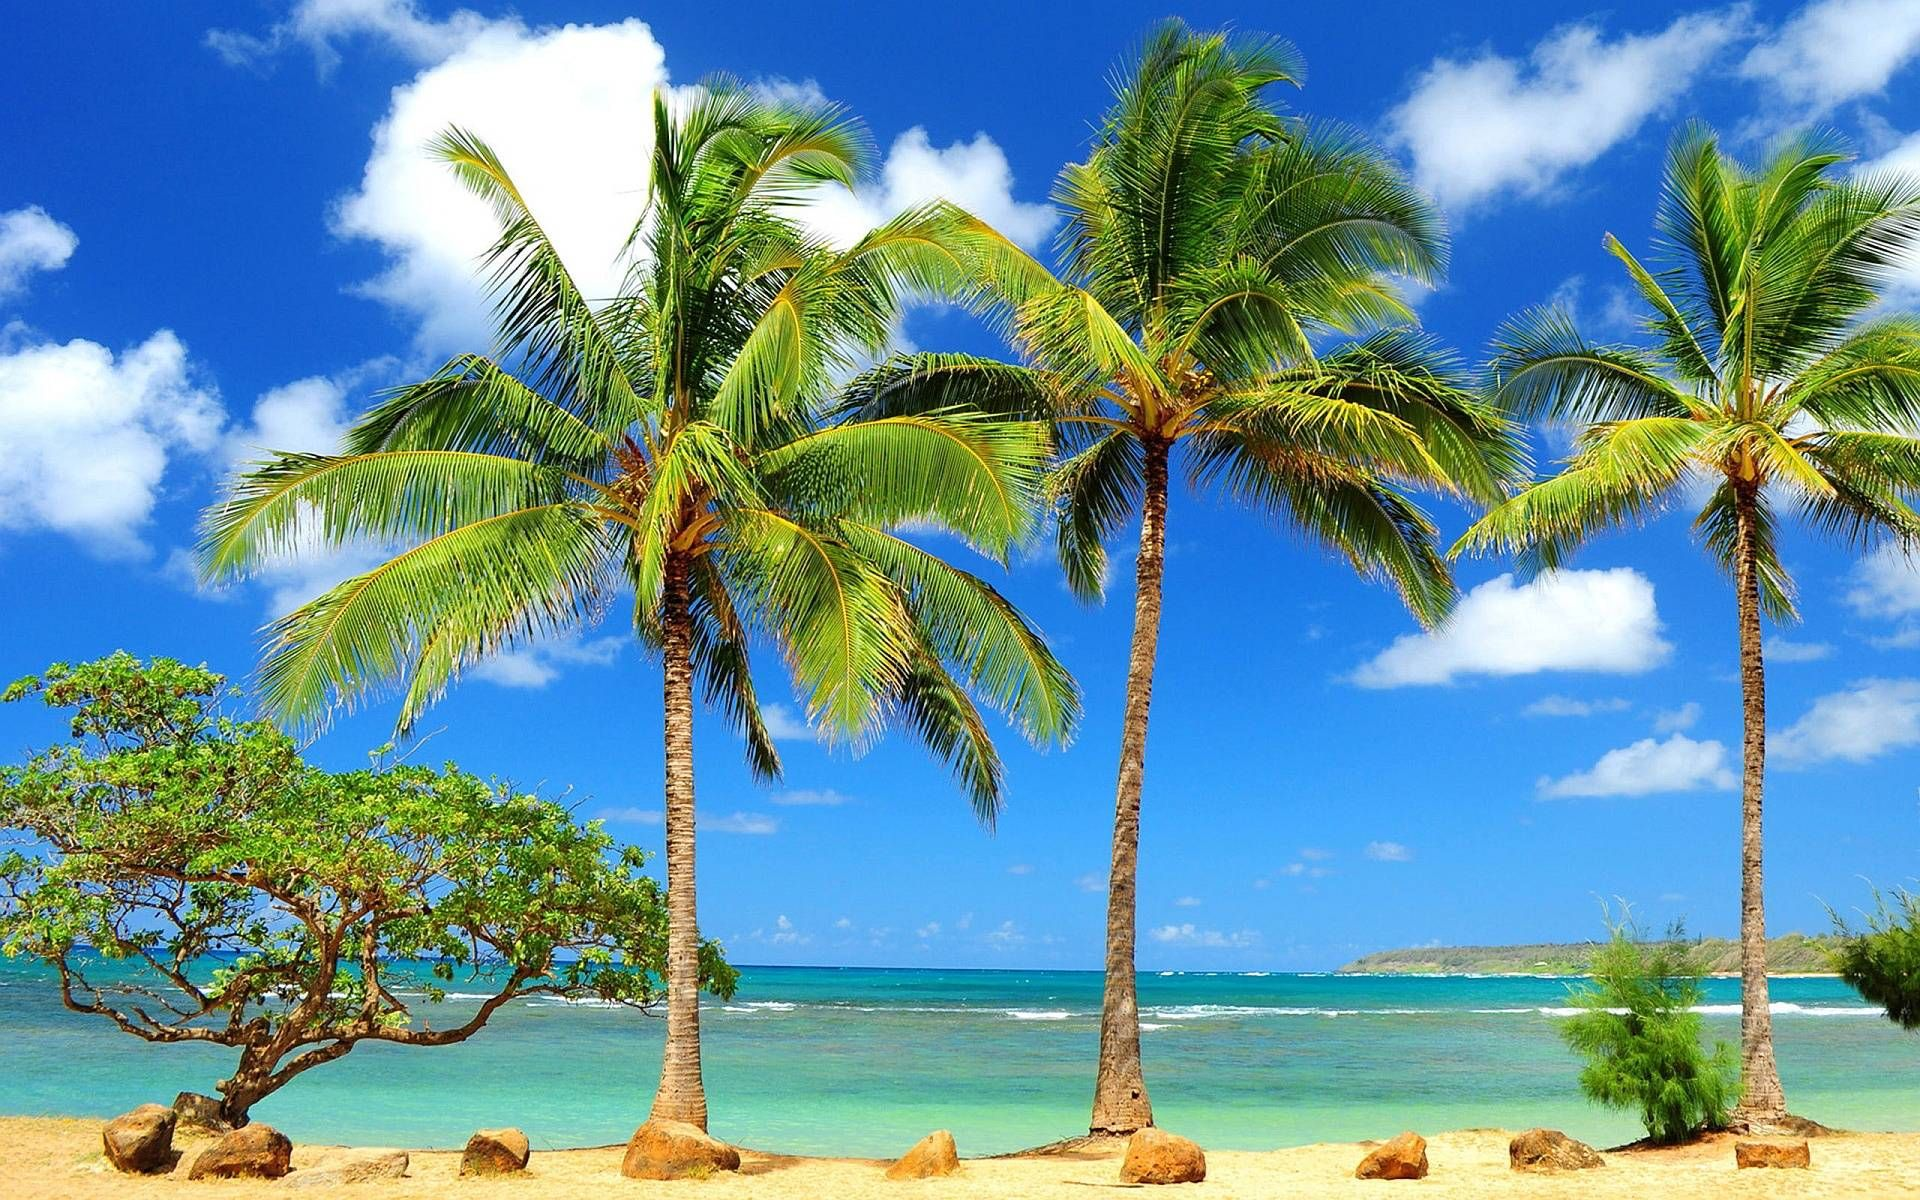 full hd p palm trees wallpapers hd desktop backgrounds 1600 1200 full hd p palm trees wallpapers hd desktop backgrounds 1600 1200 palm tree wallpaper